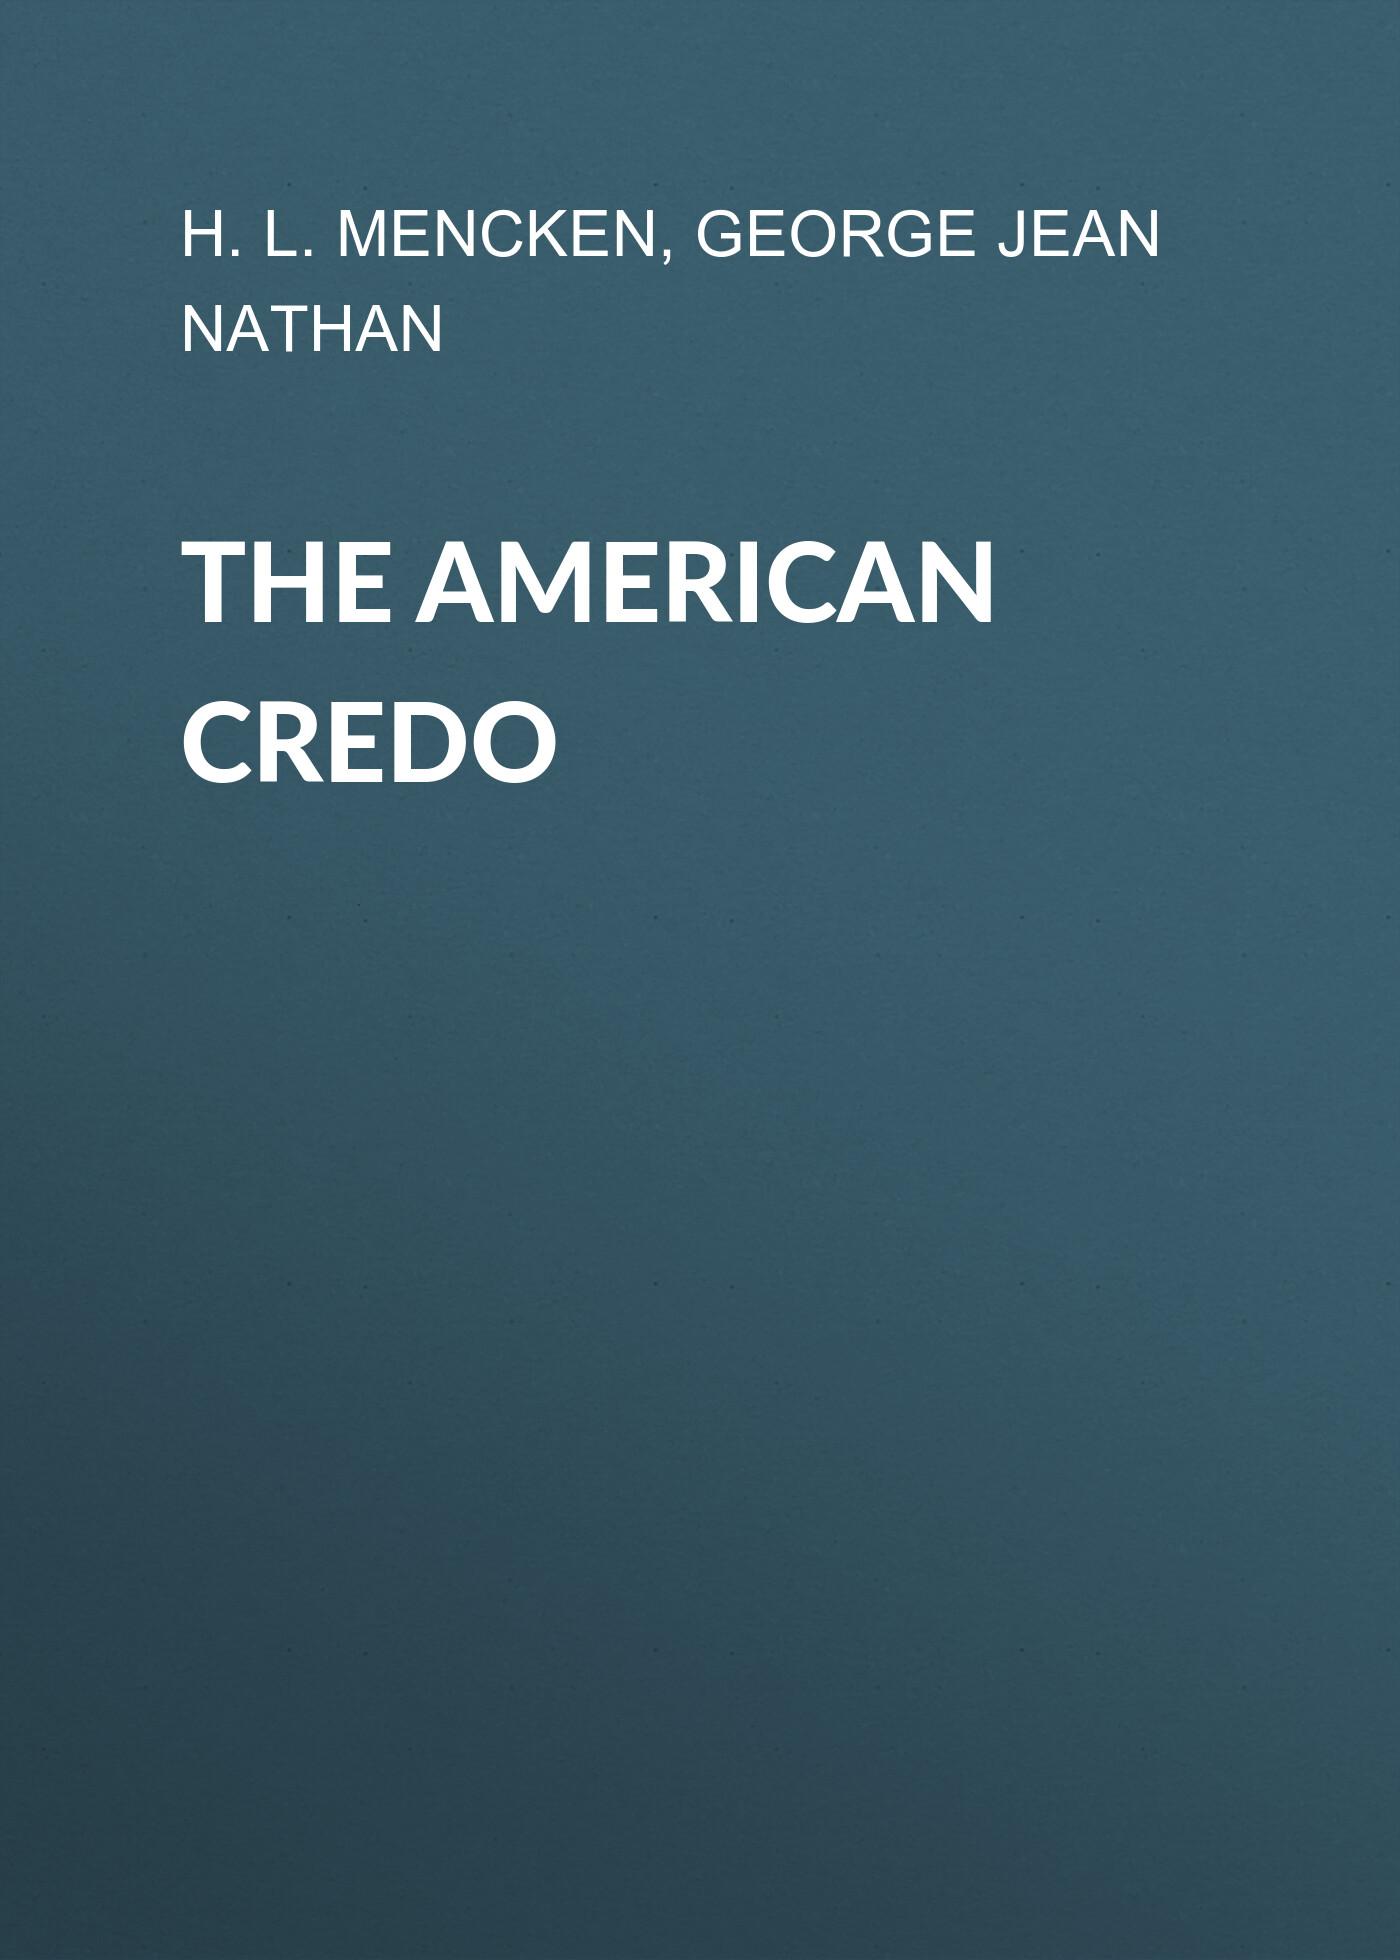 The American Credo